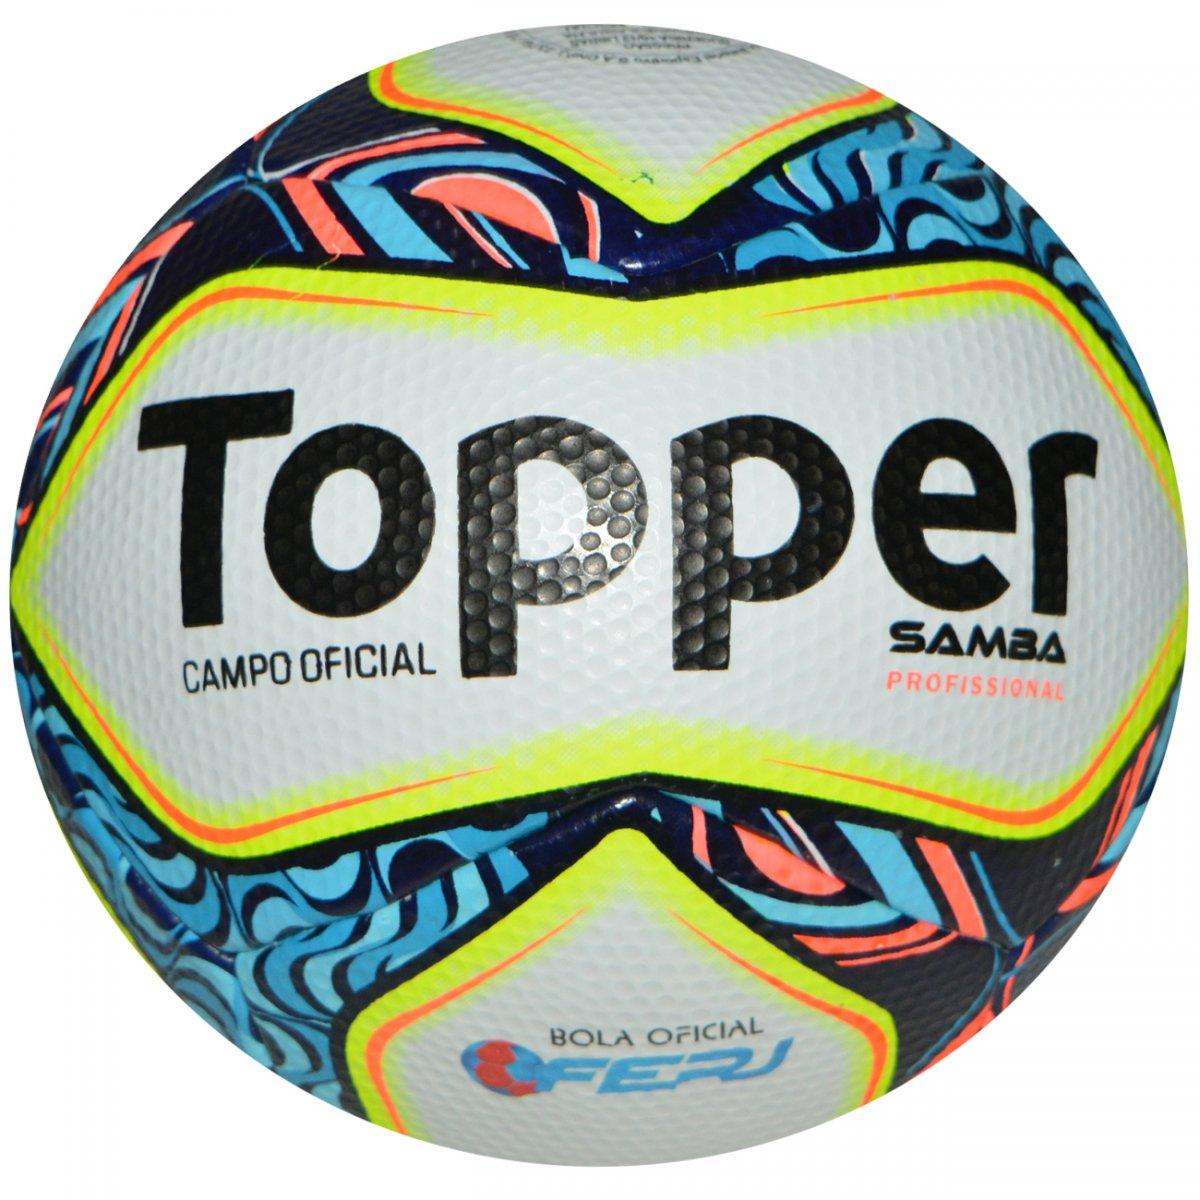 a5a426eb3d1f2 Bola Topper Samba Pro 4140040 0455 99 - Branco azul amarelo - Chuteira  Nike